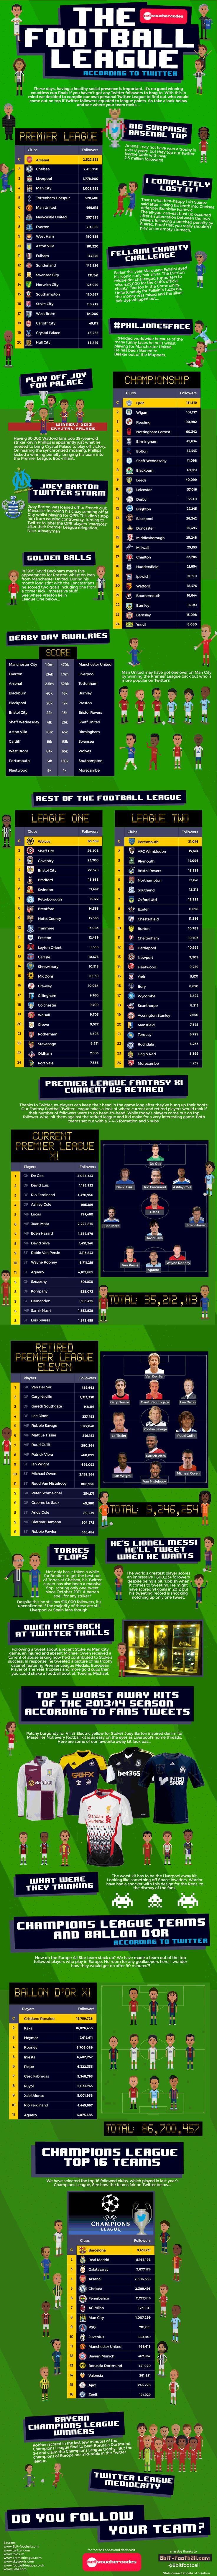 The Football League According